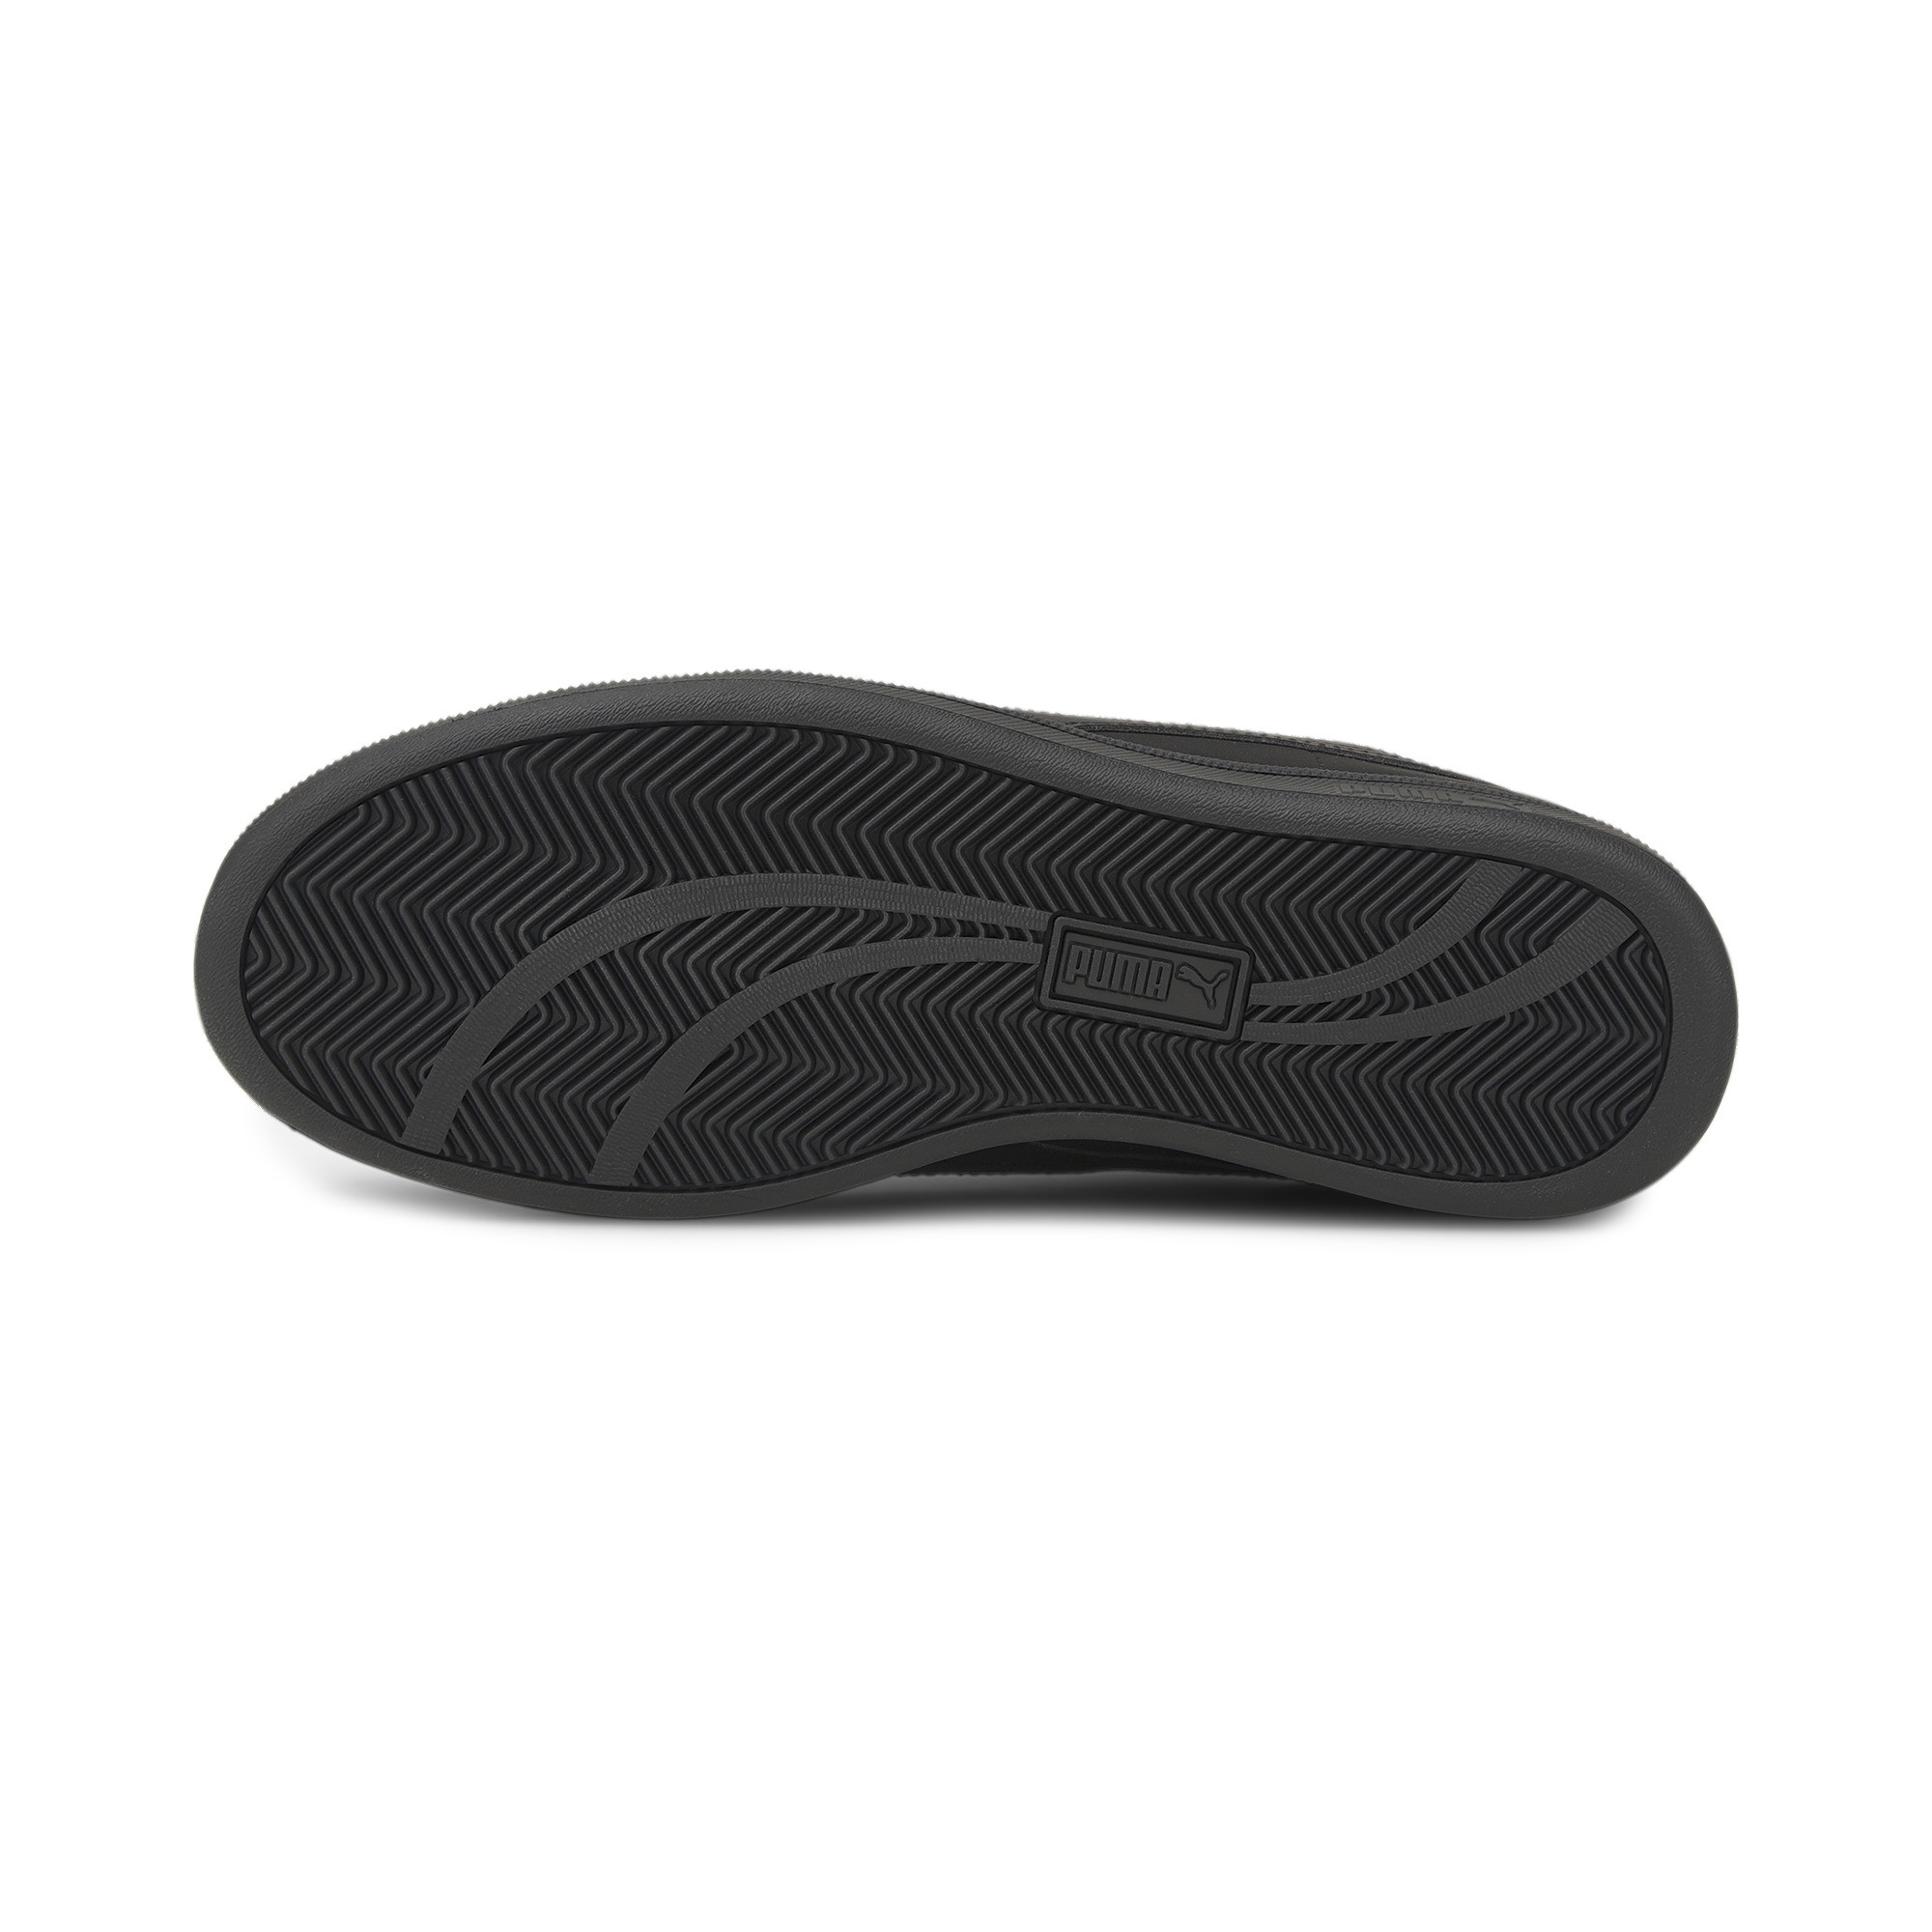 Indexbild 21 - PUMA Smash Buck Sneaker Unisex Schuhe Sport Classics Neu